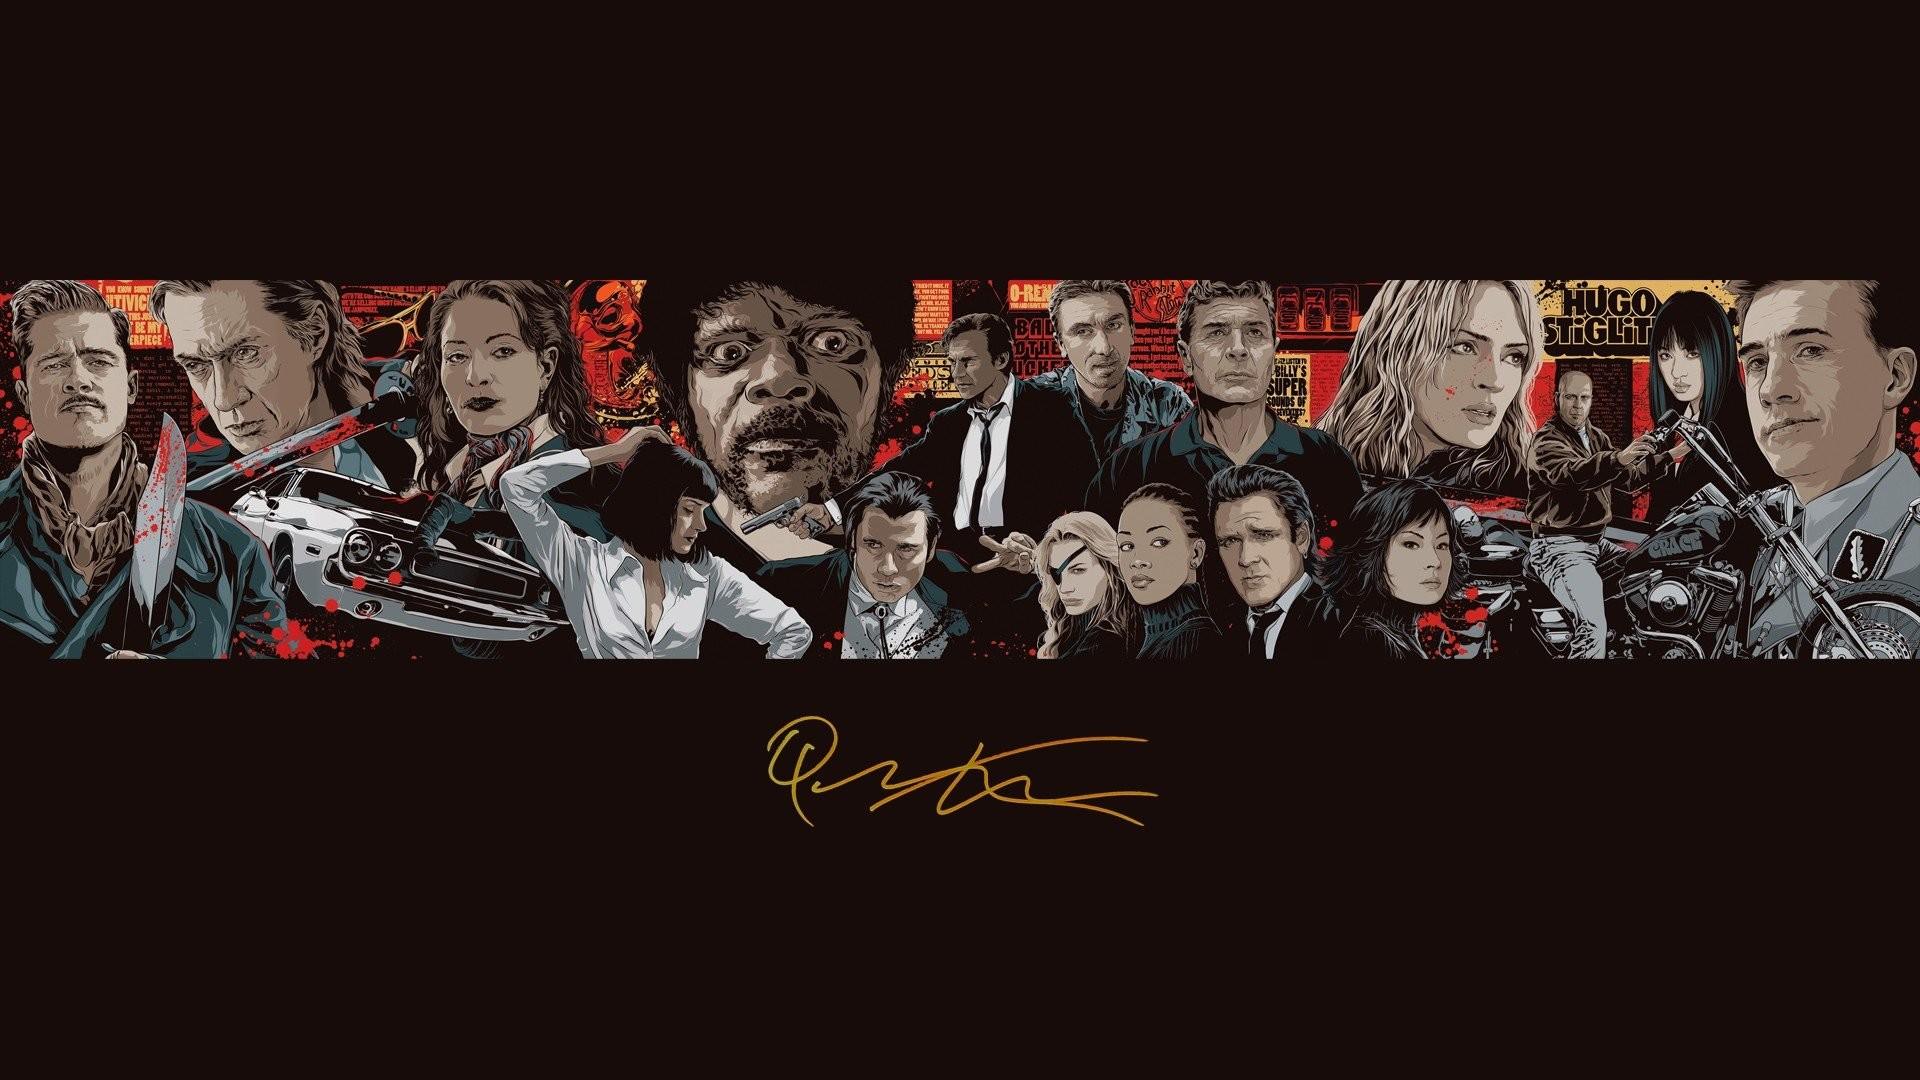 Pulp Fiction Wallpapers Wallpapertag